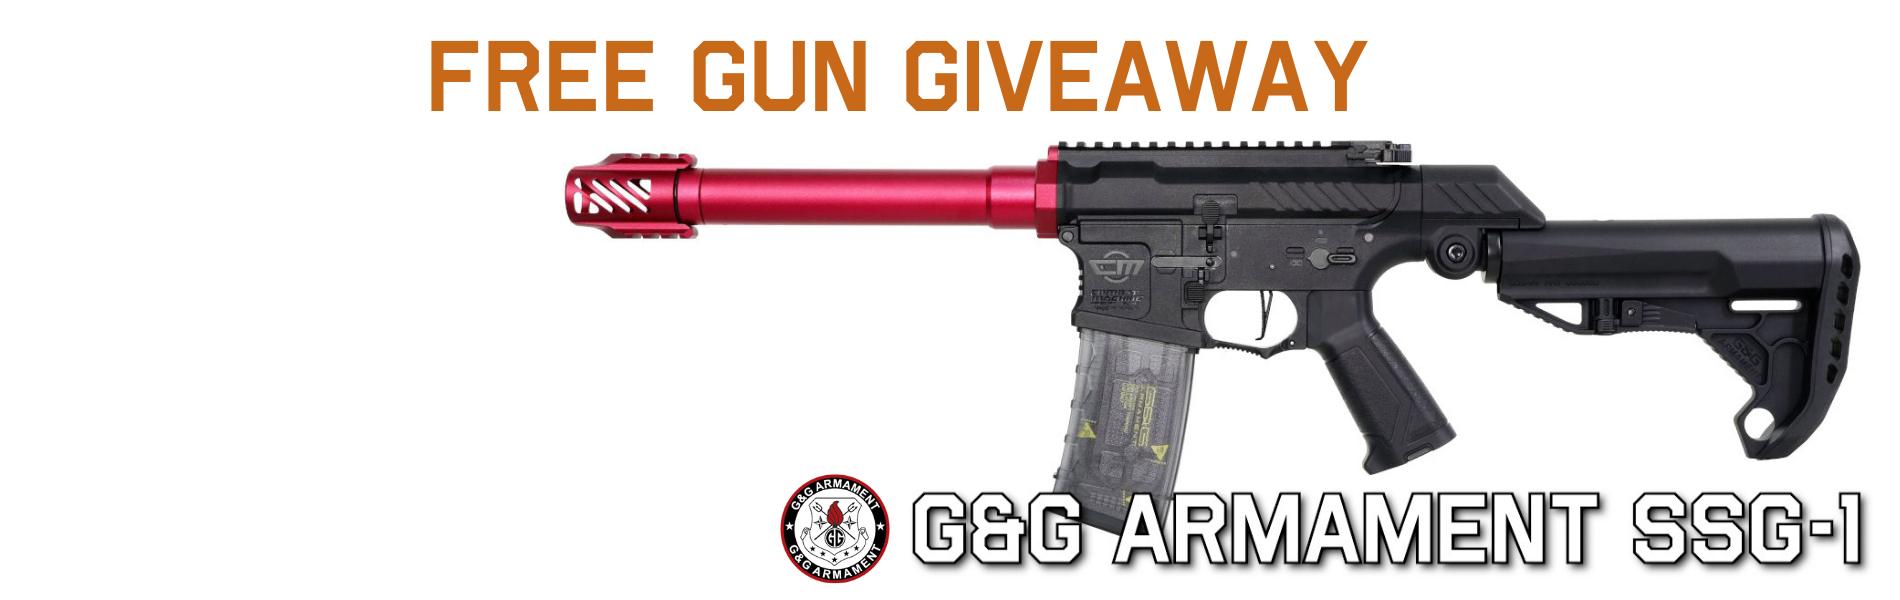 free-gun-giveaway-6-30-21-1-.png